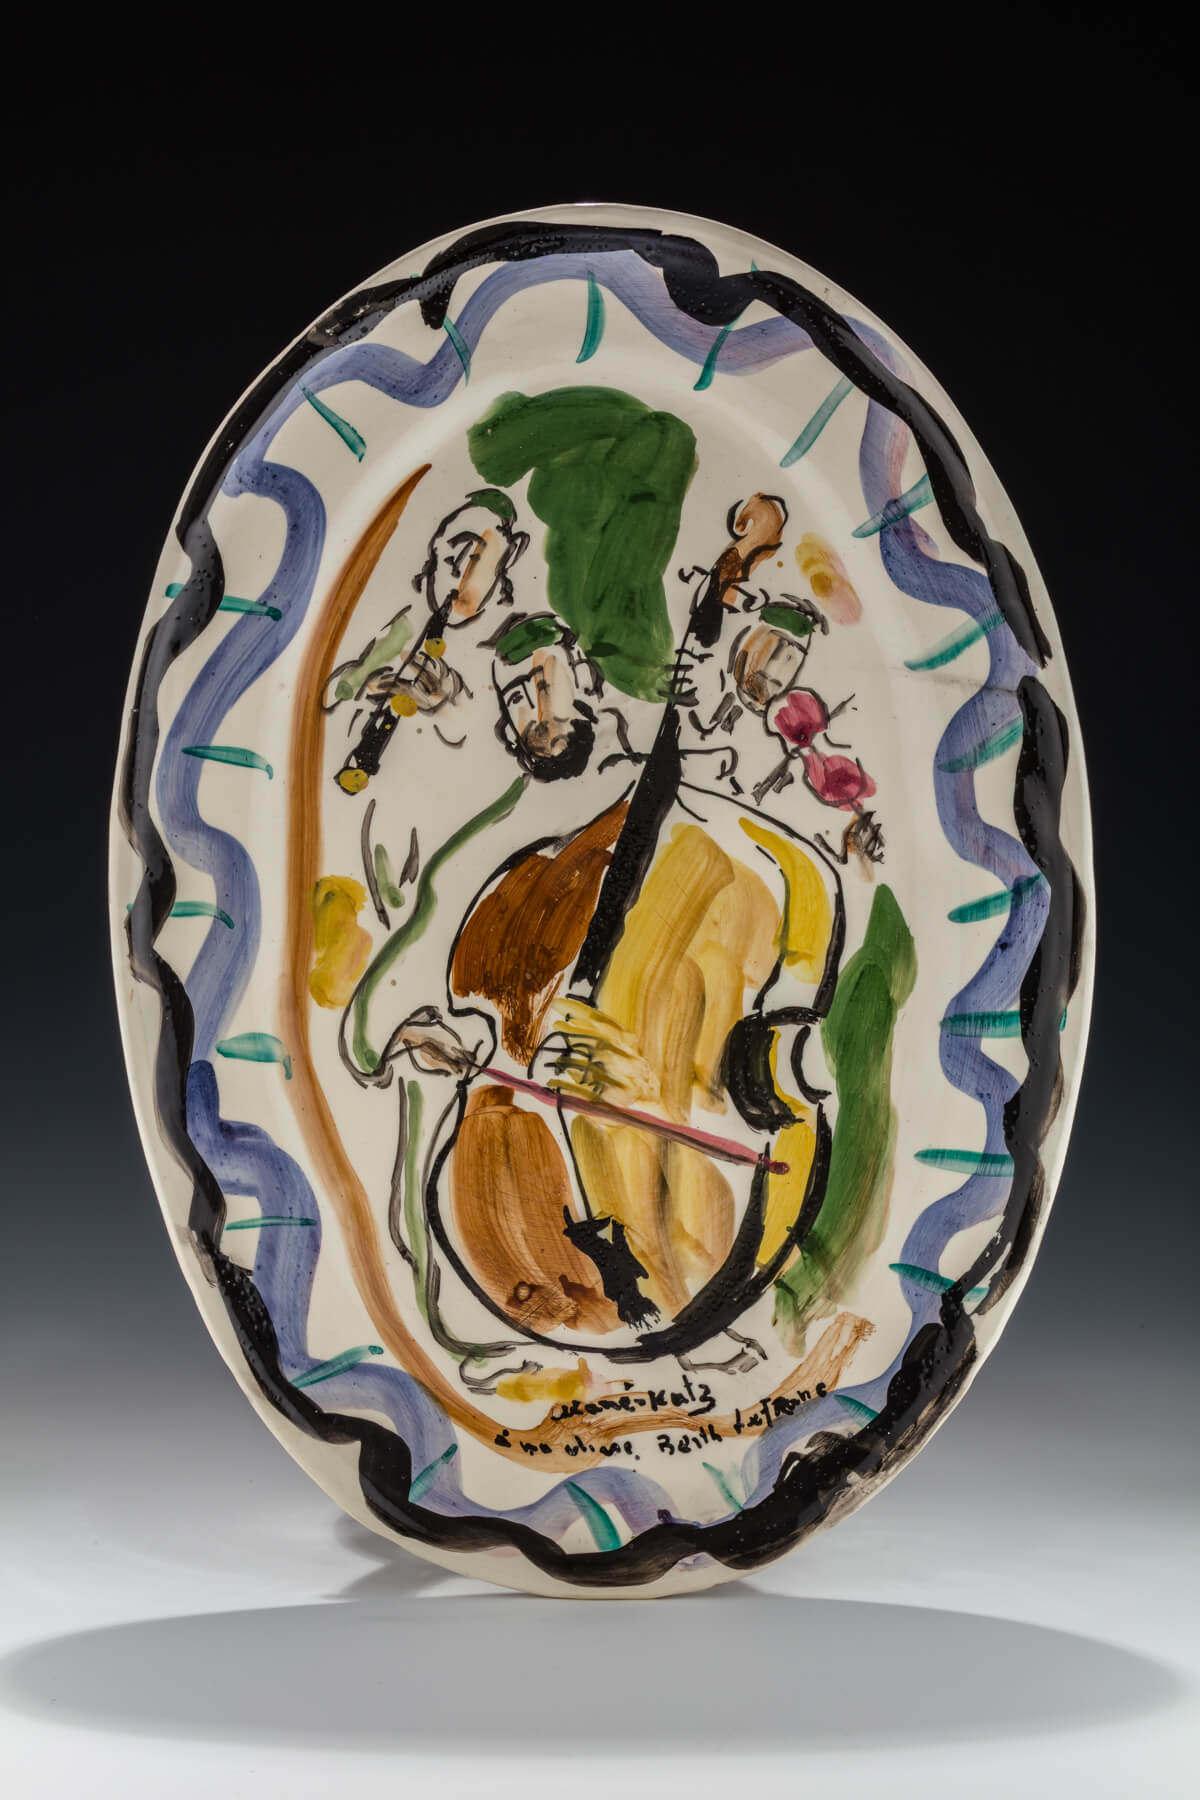 158. A Ceramic Plate by Mane Katz